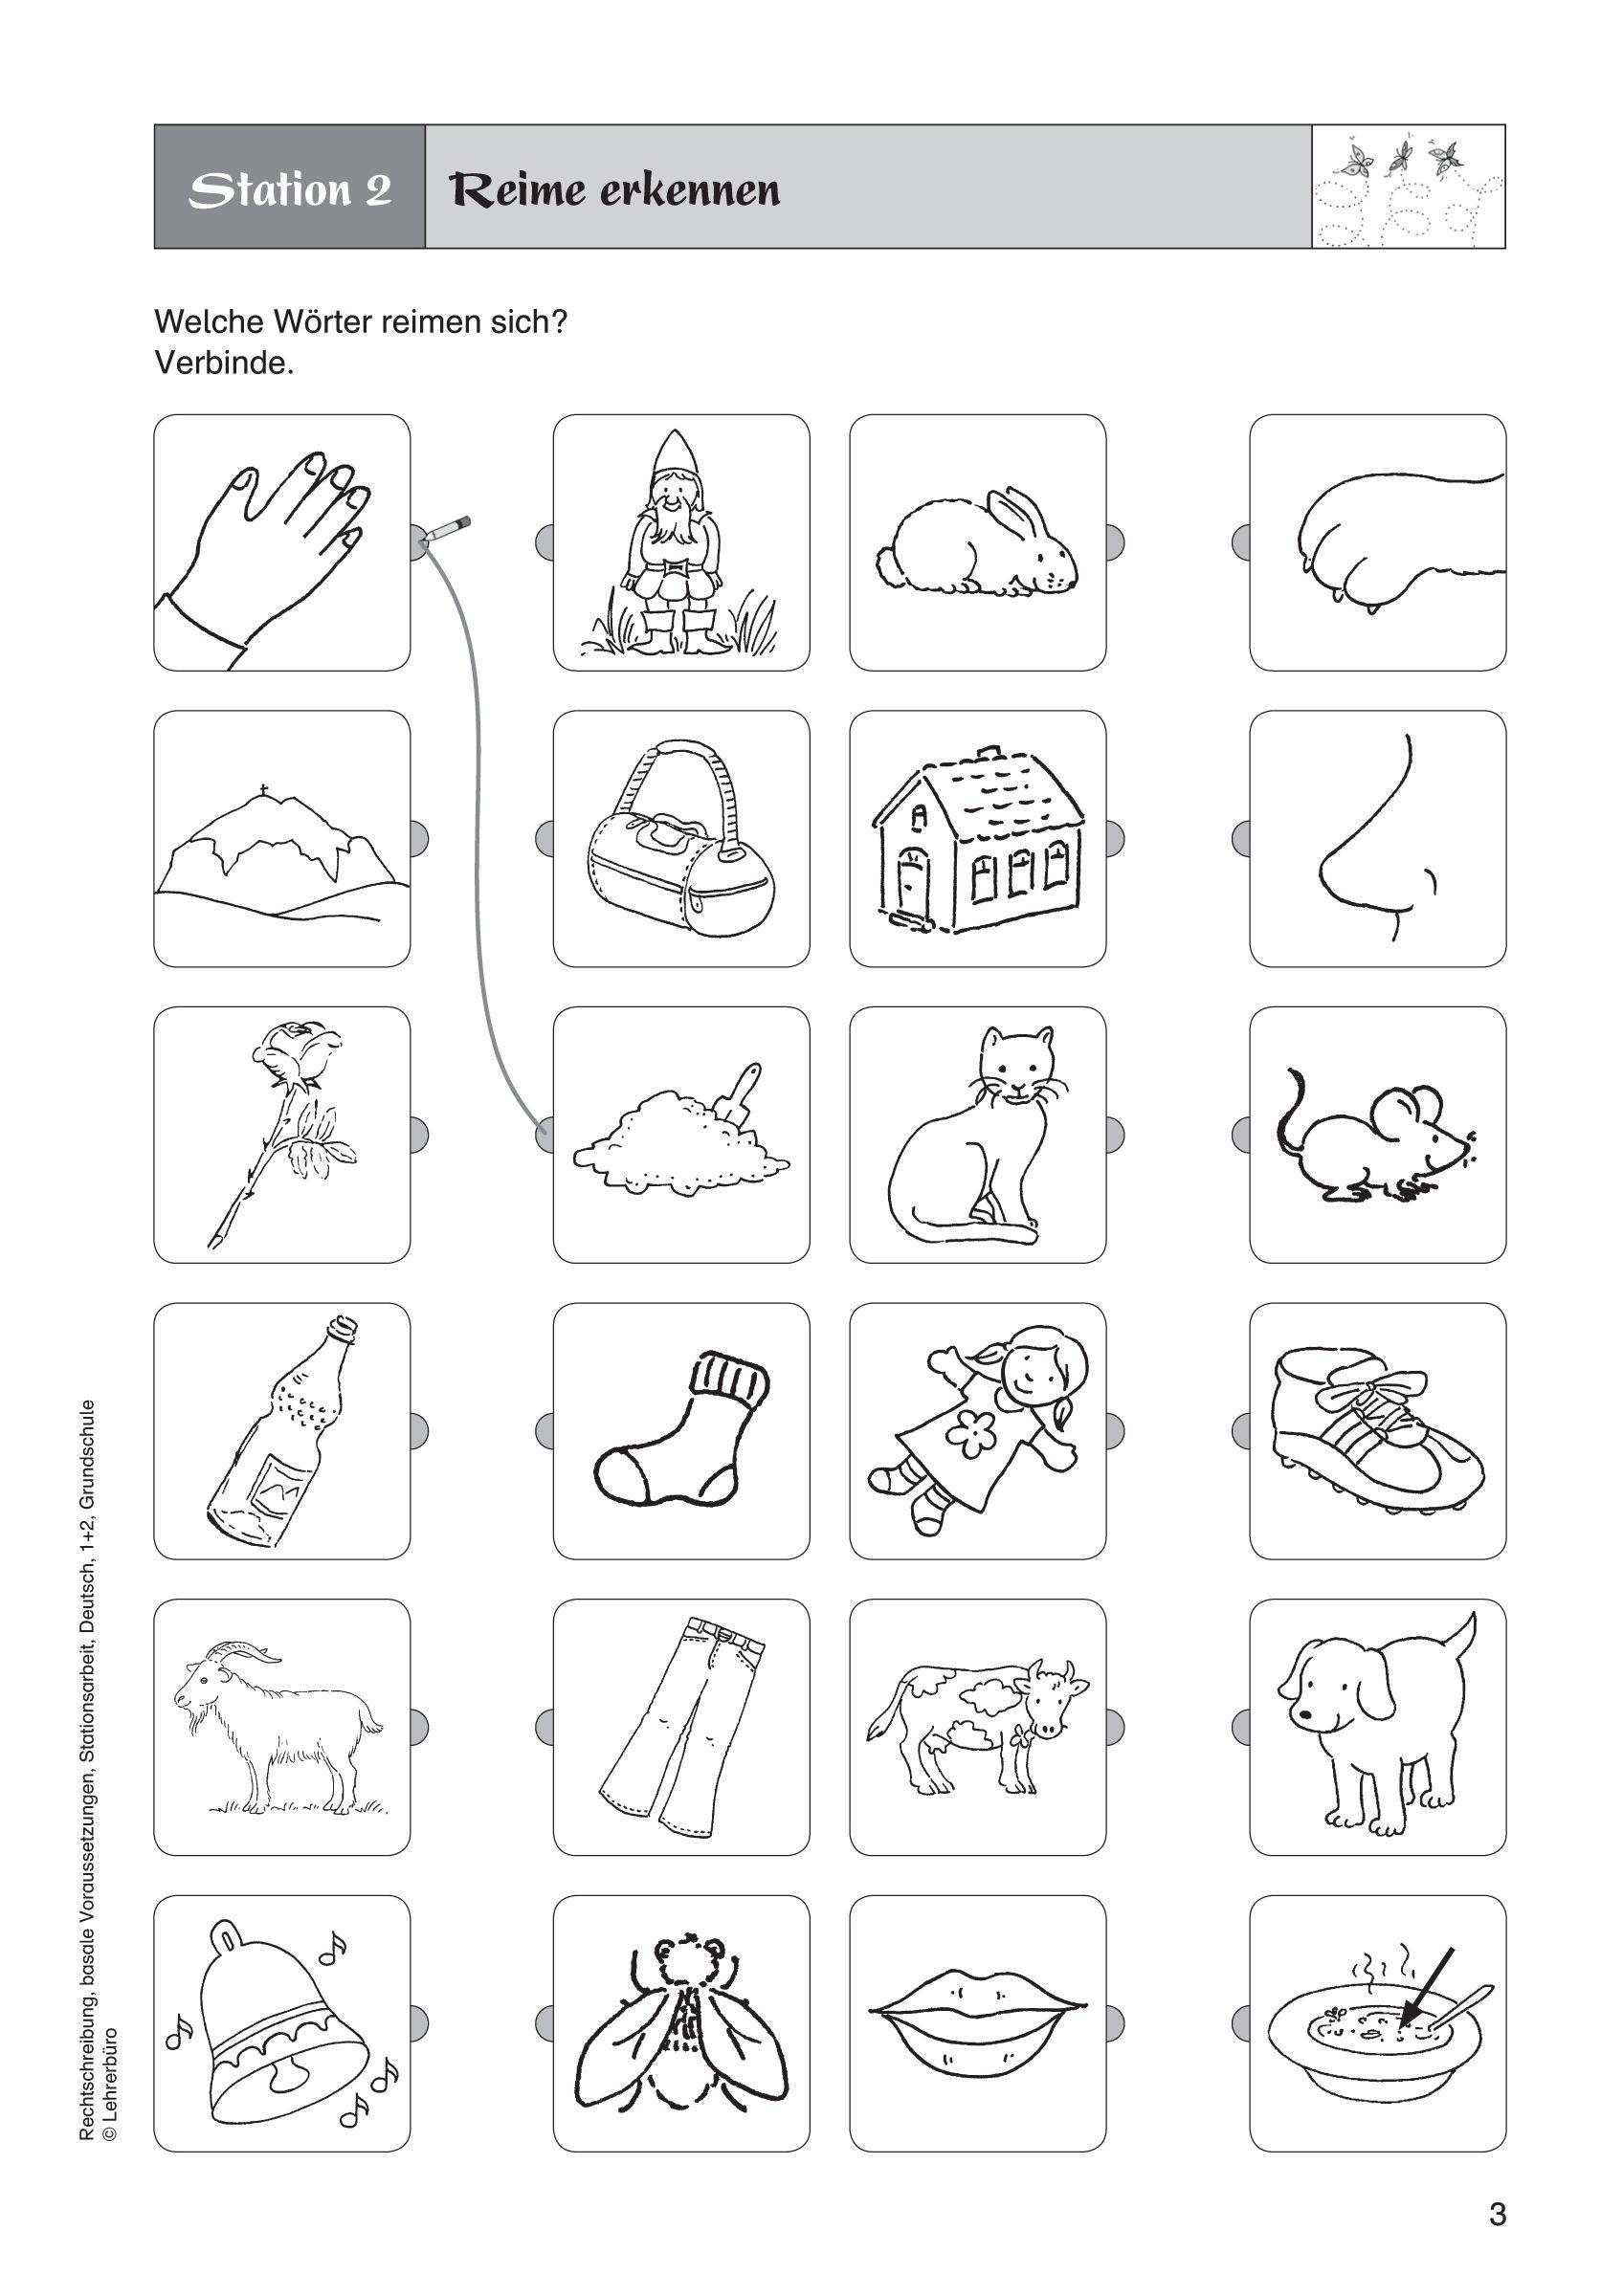 Arbeitsblätter Grundschule 1 Klasse Ausdrucken 1 Klasse in Arbeitsblätter Vorschule